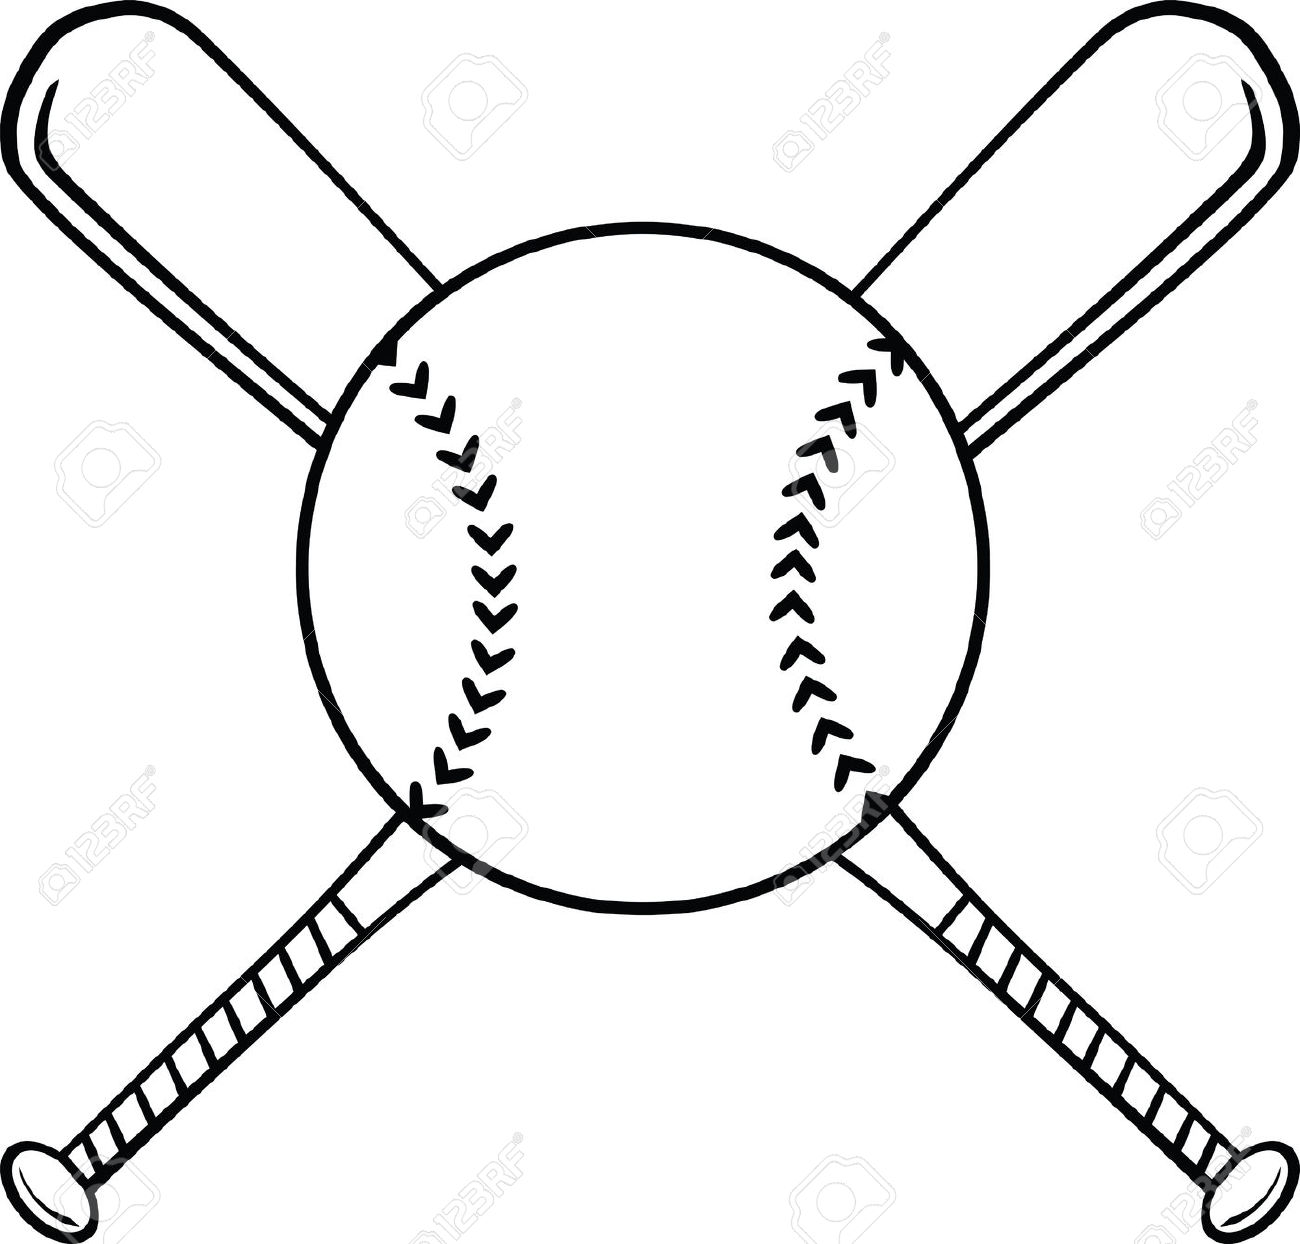 Black and white baseball clipart